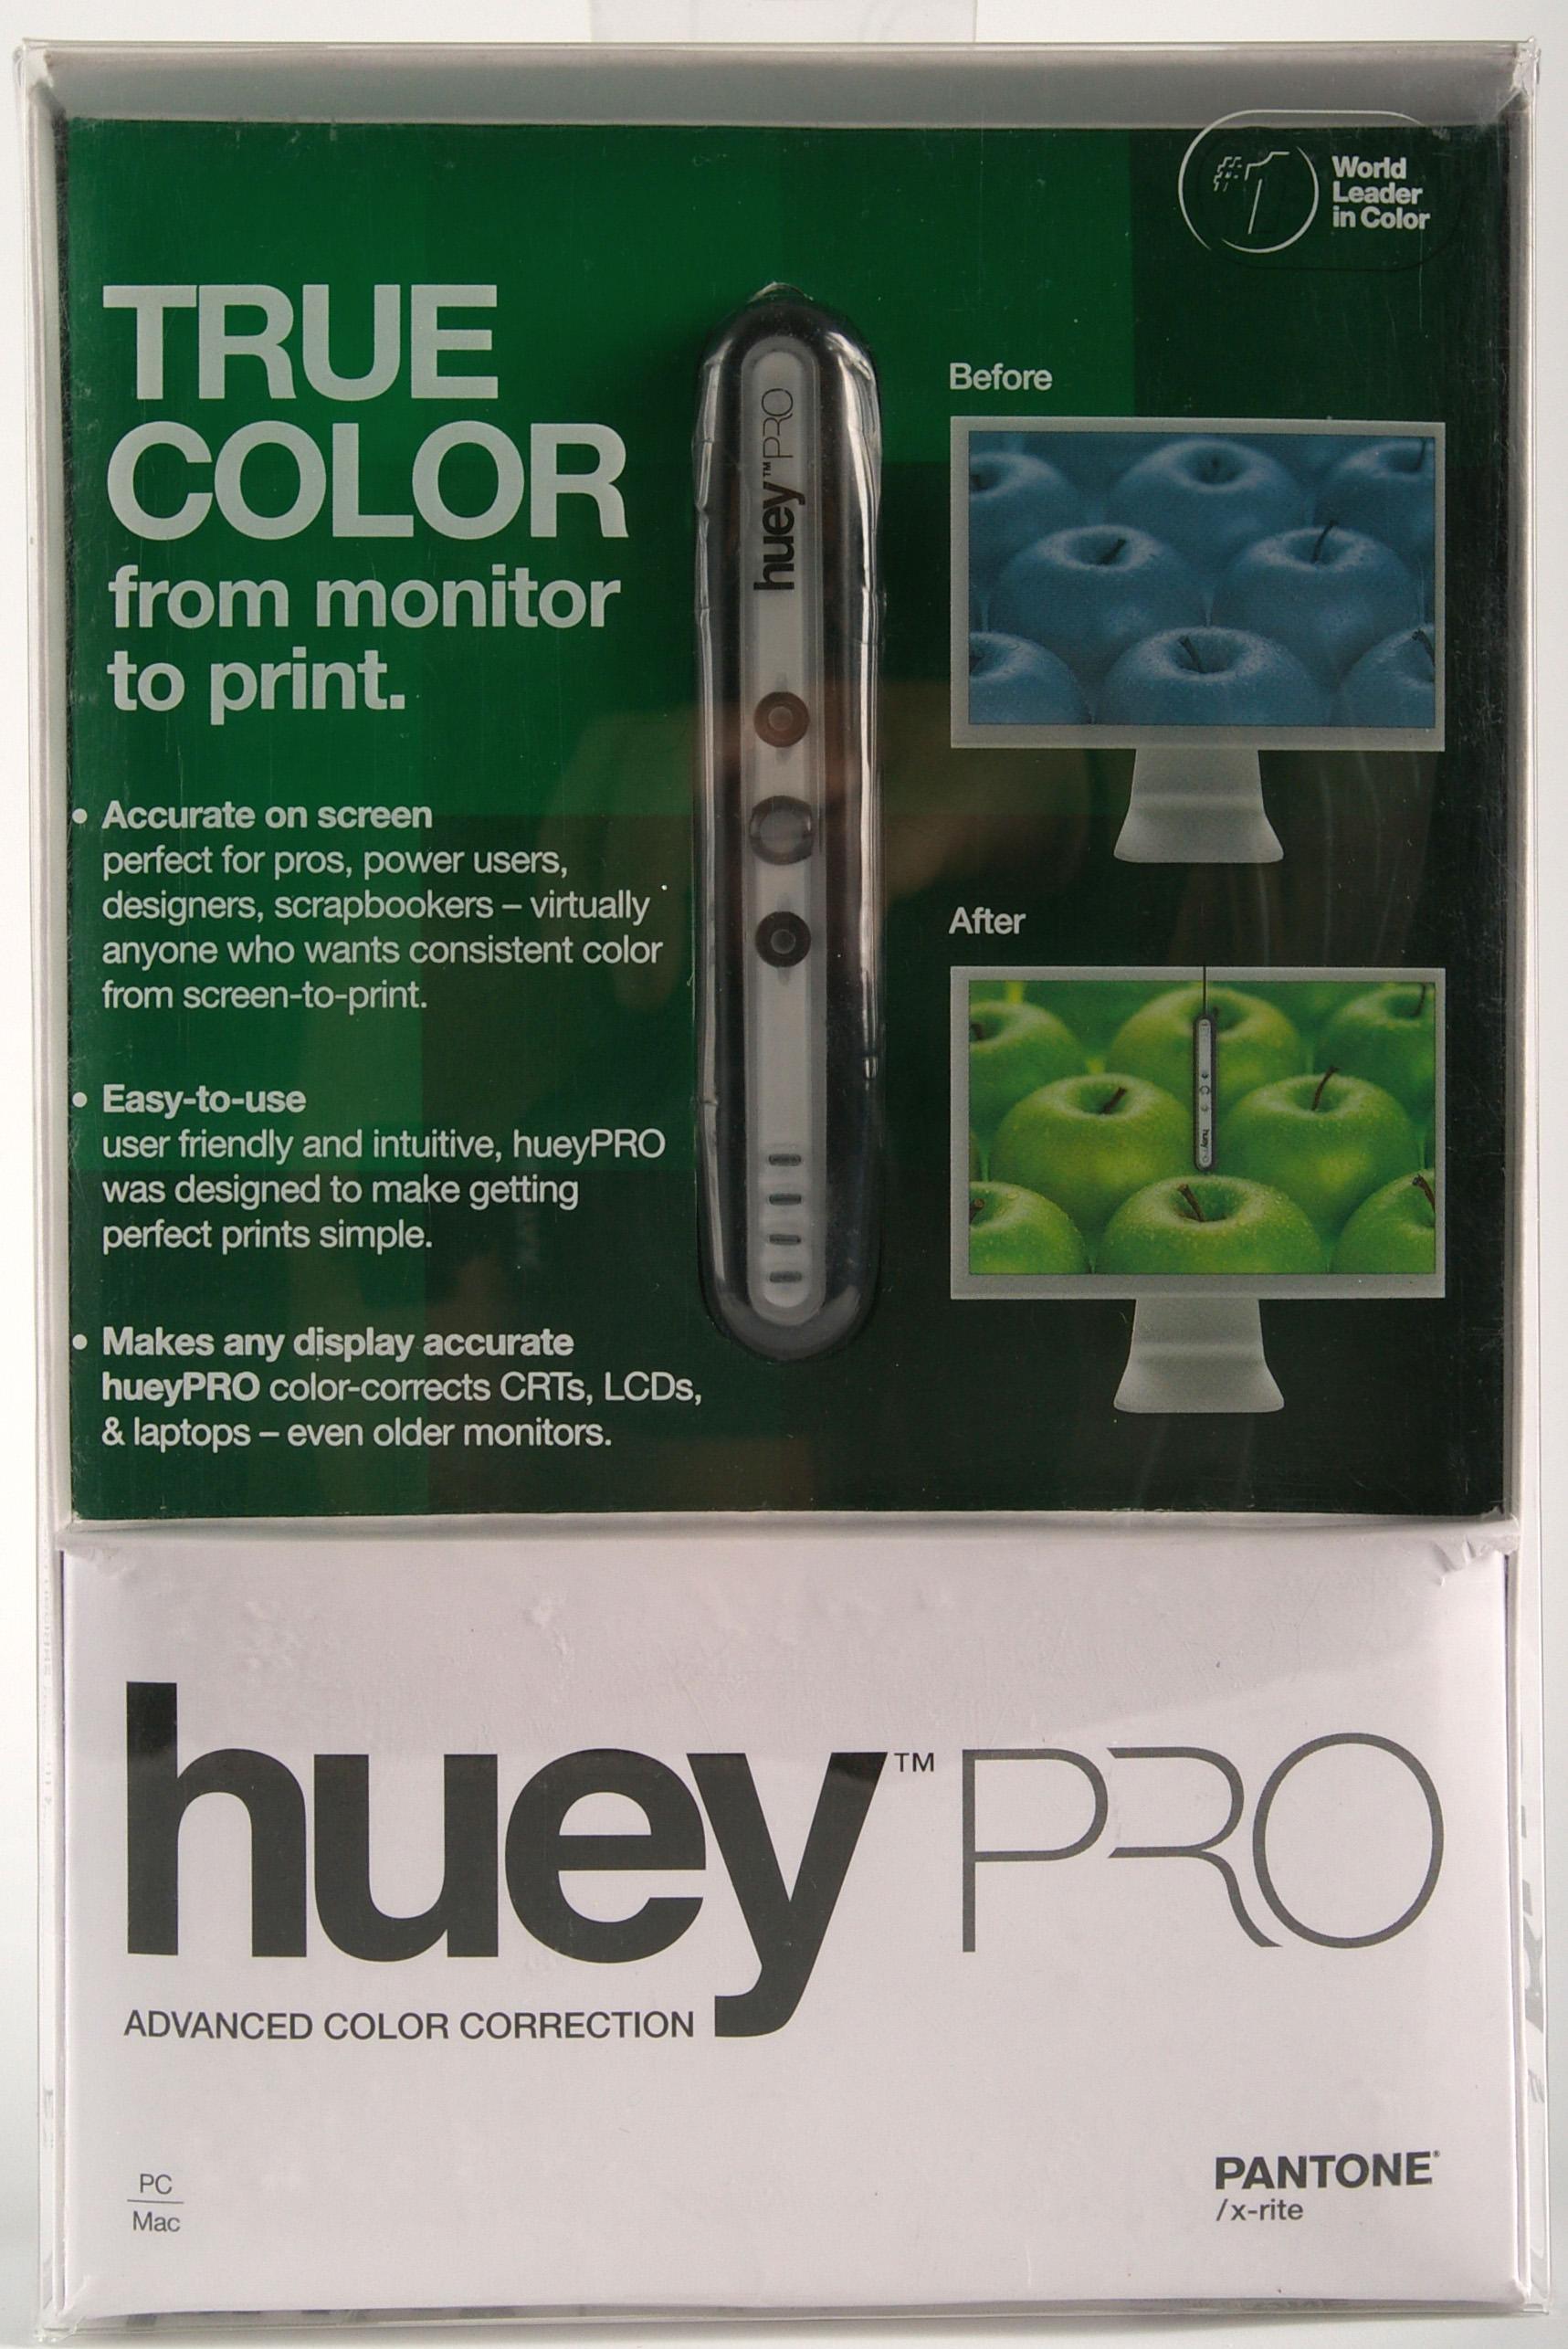 Pantone Huey Pro Calibration unit Display Device Review